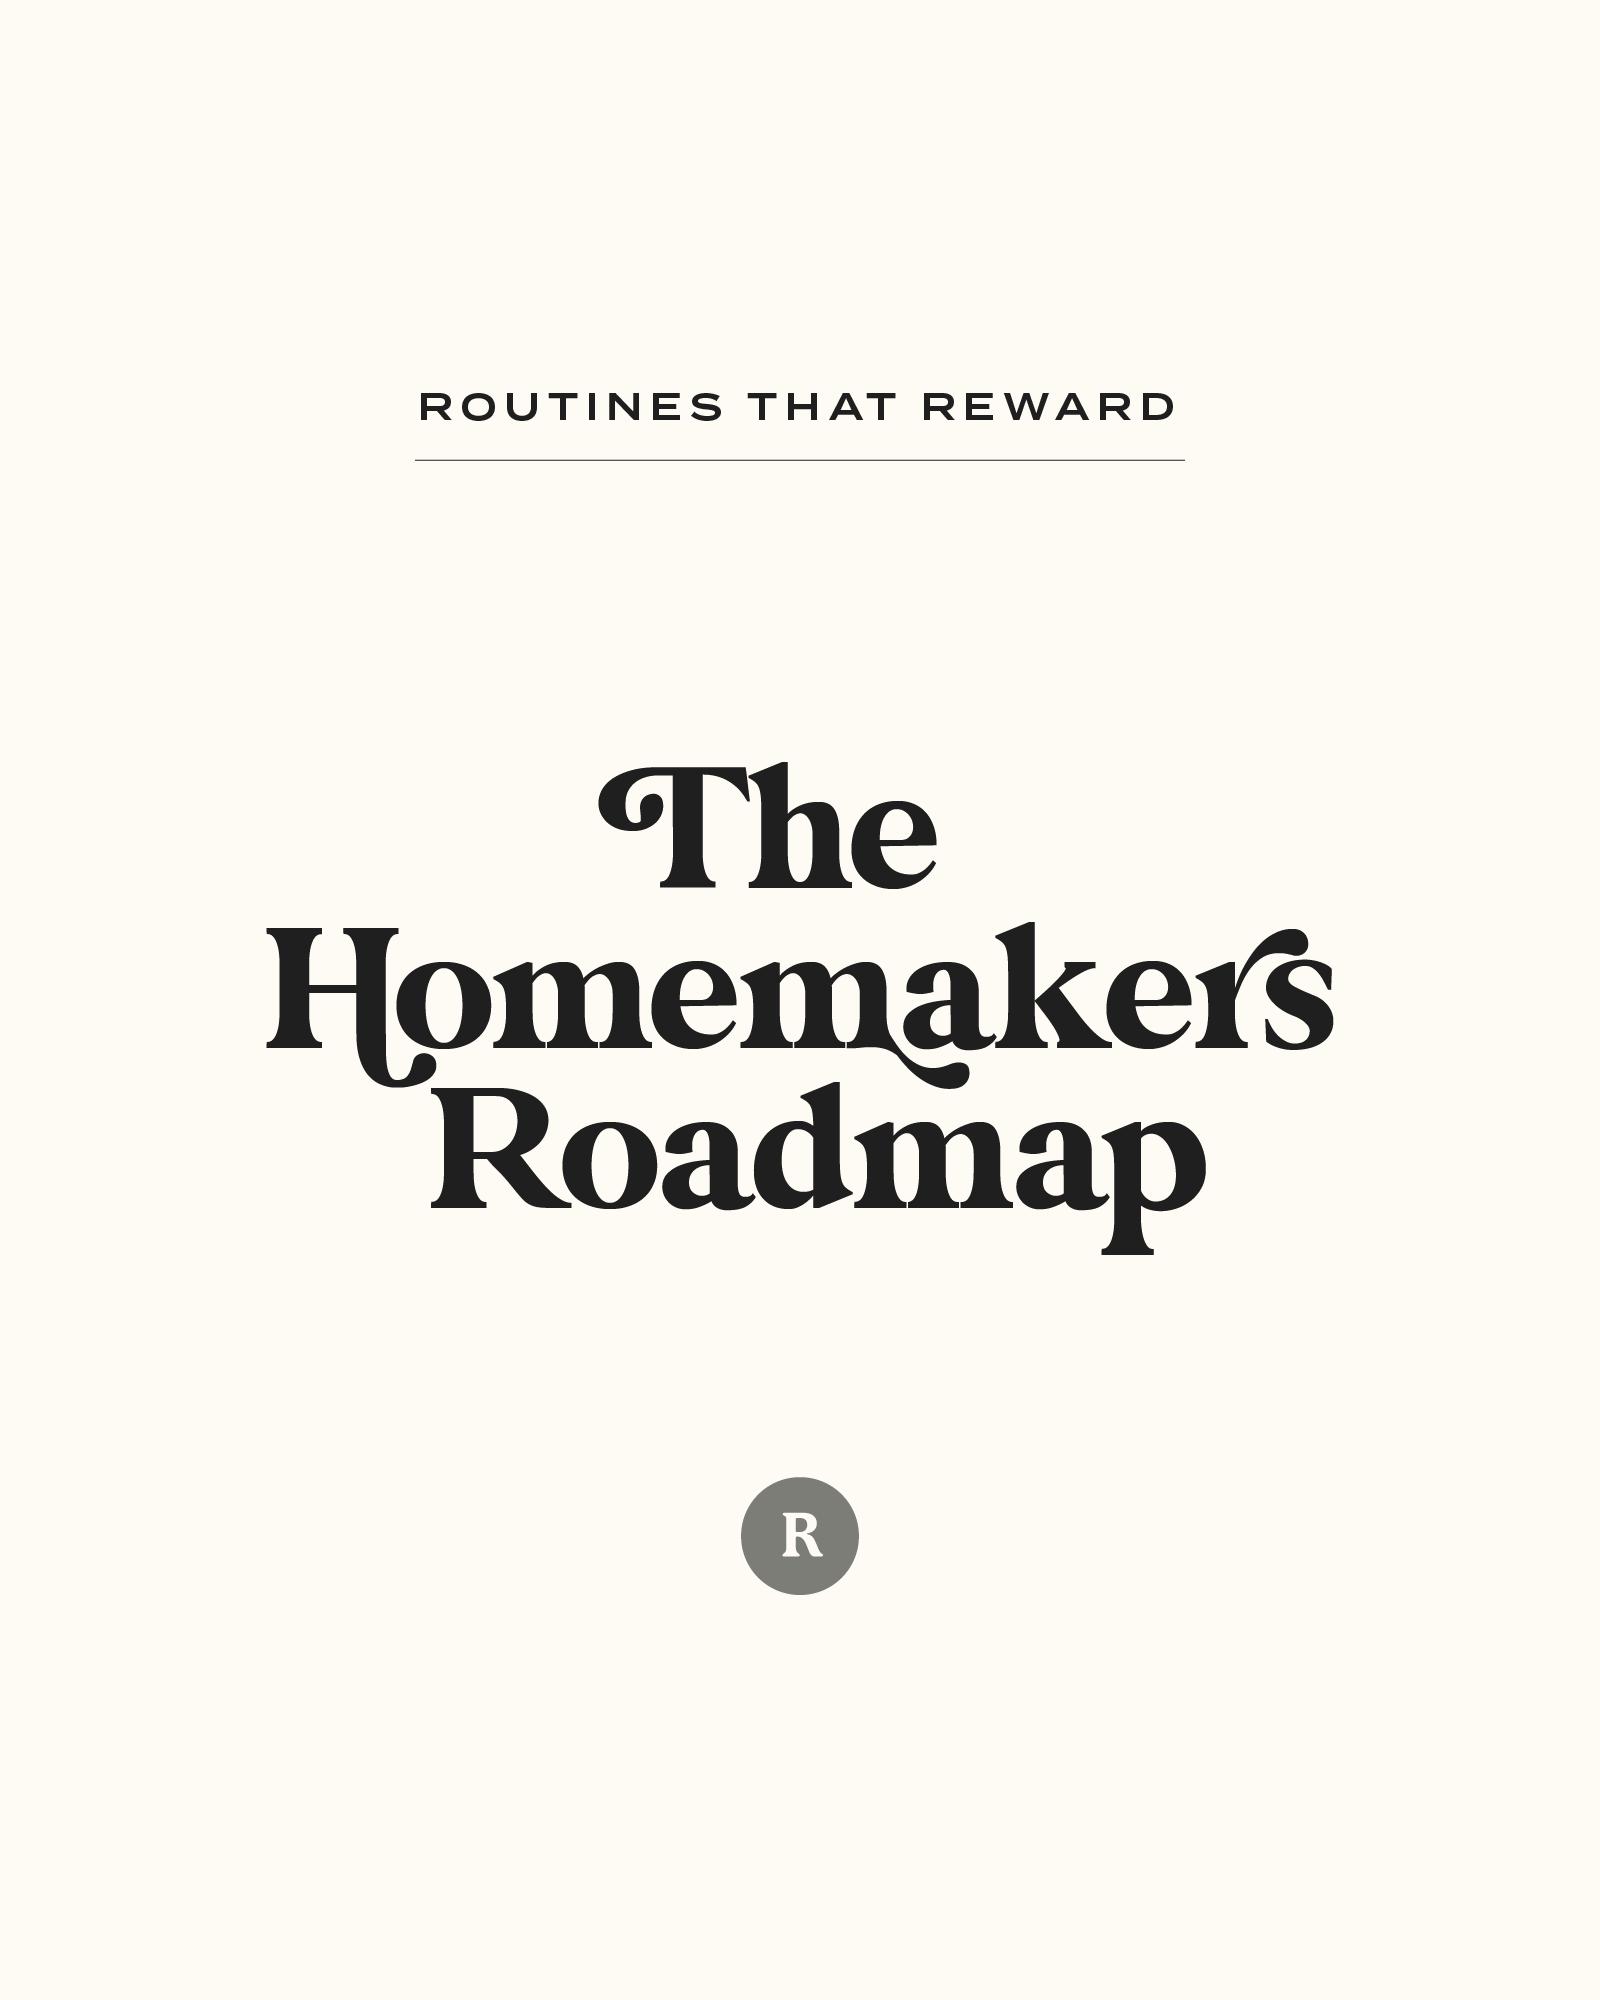 The Homemakers Roadmap